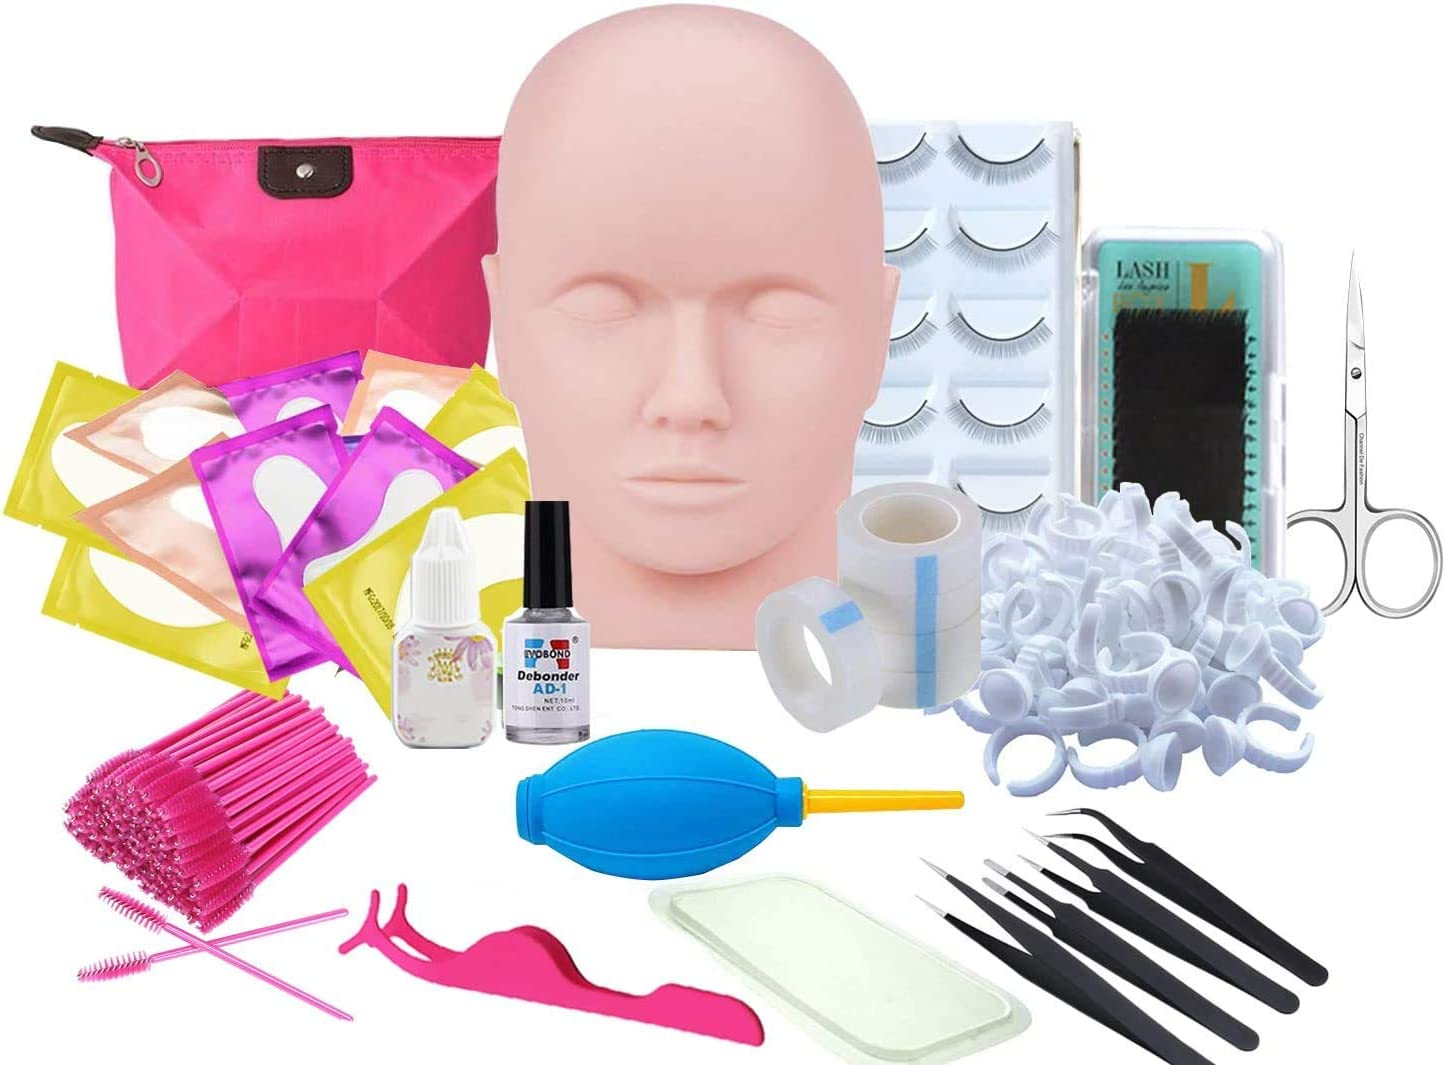 Eyelash Extension kit, Missicee Eyelash Training Kit Professional Eyelash Practice Head Kit for False Eyelashes Extensions, Massage Practicing, Practice Make Up with a Bag